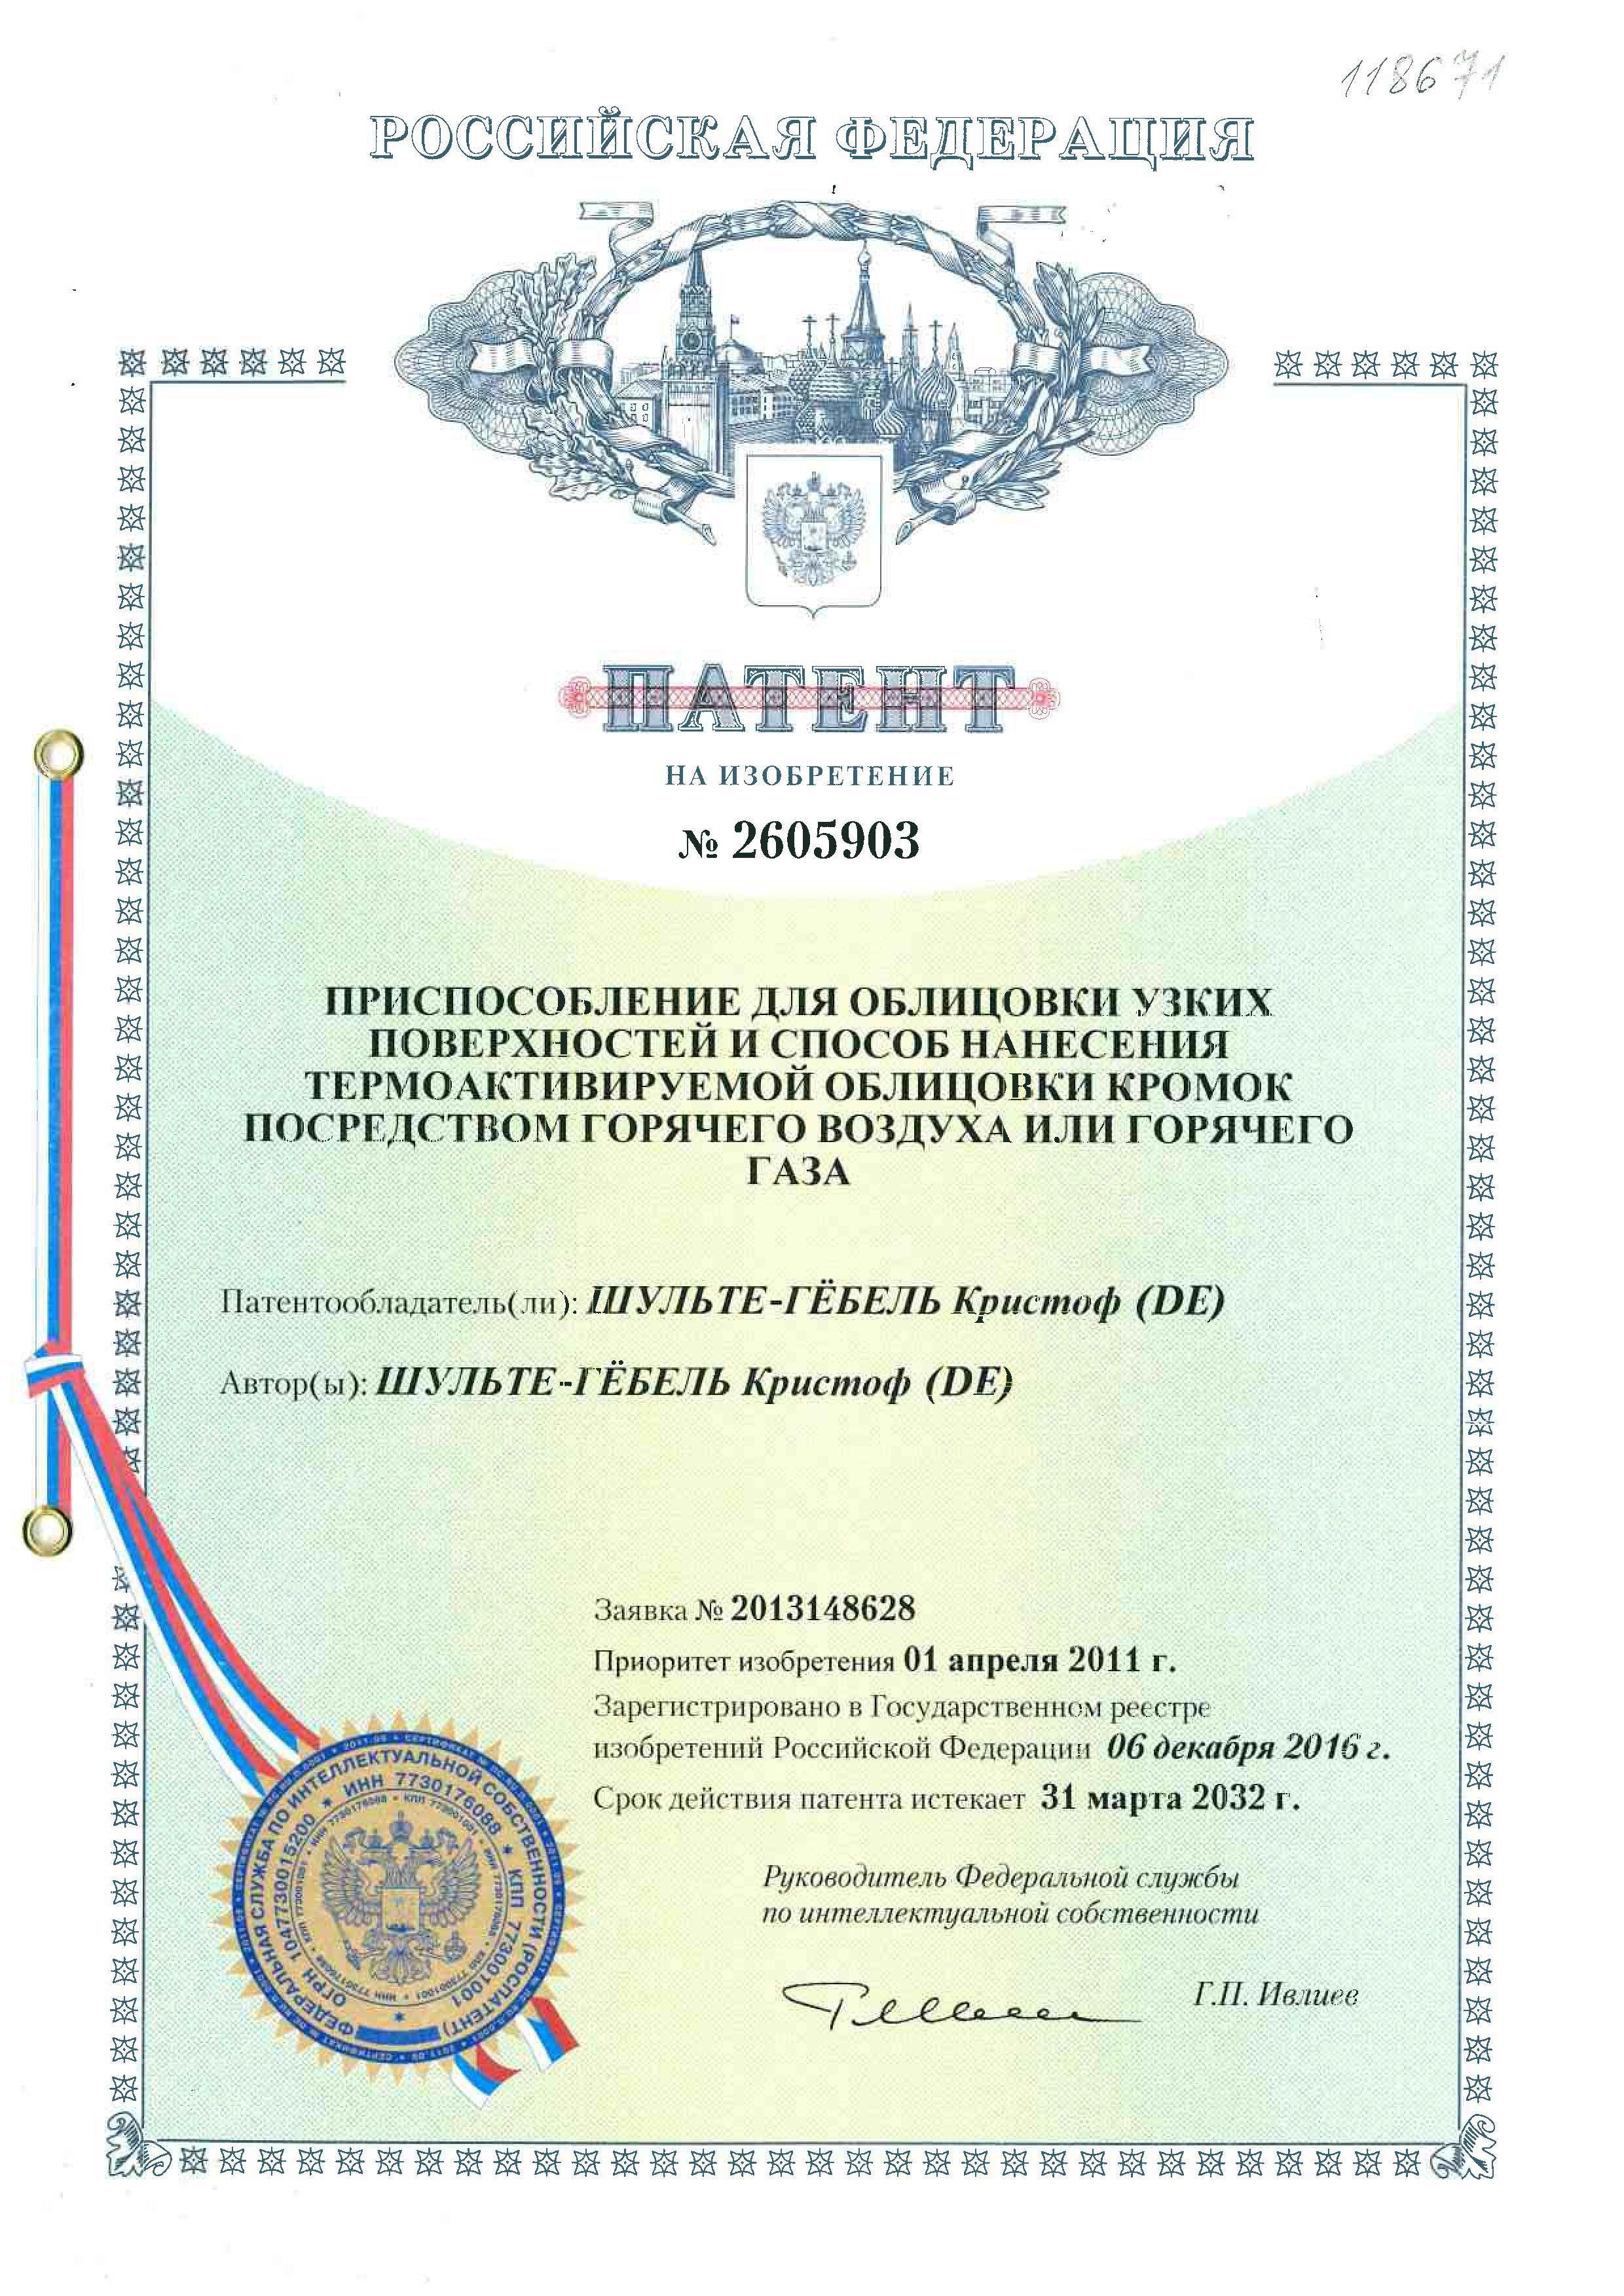 Hot_Air_Russland_Seite_1